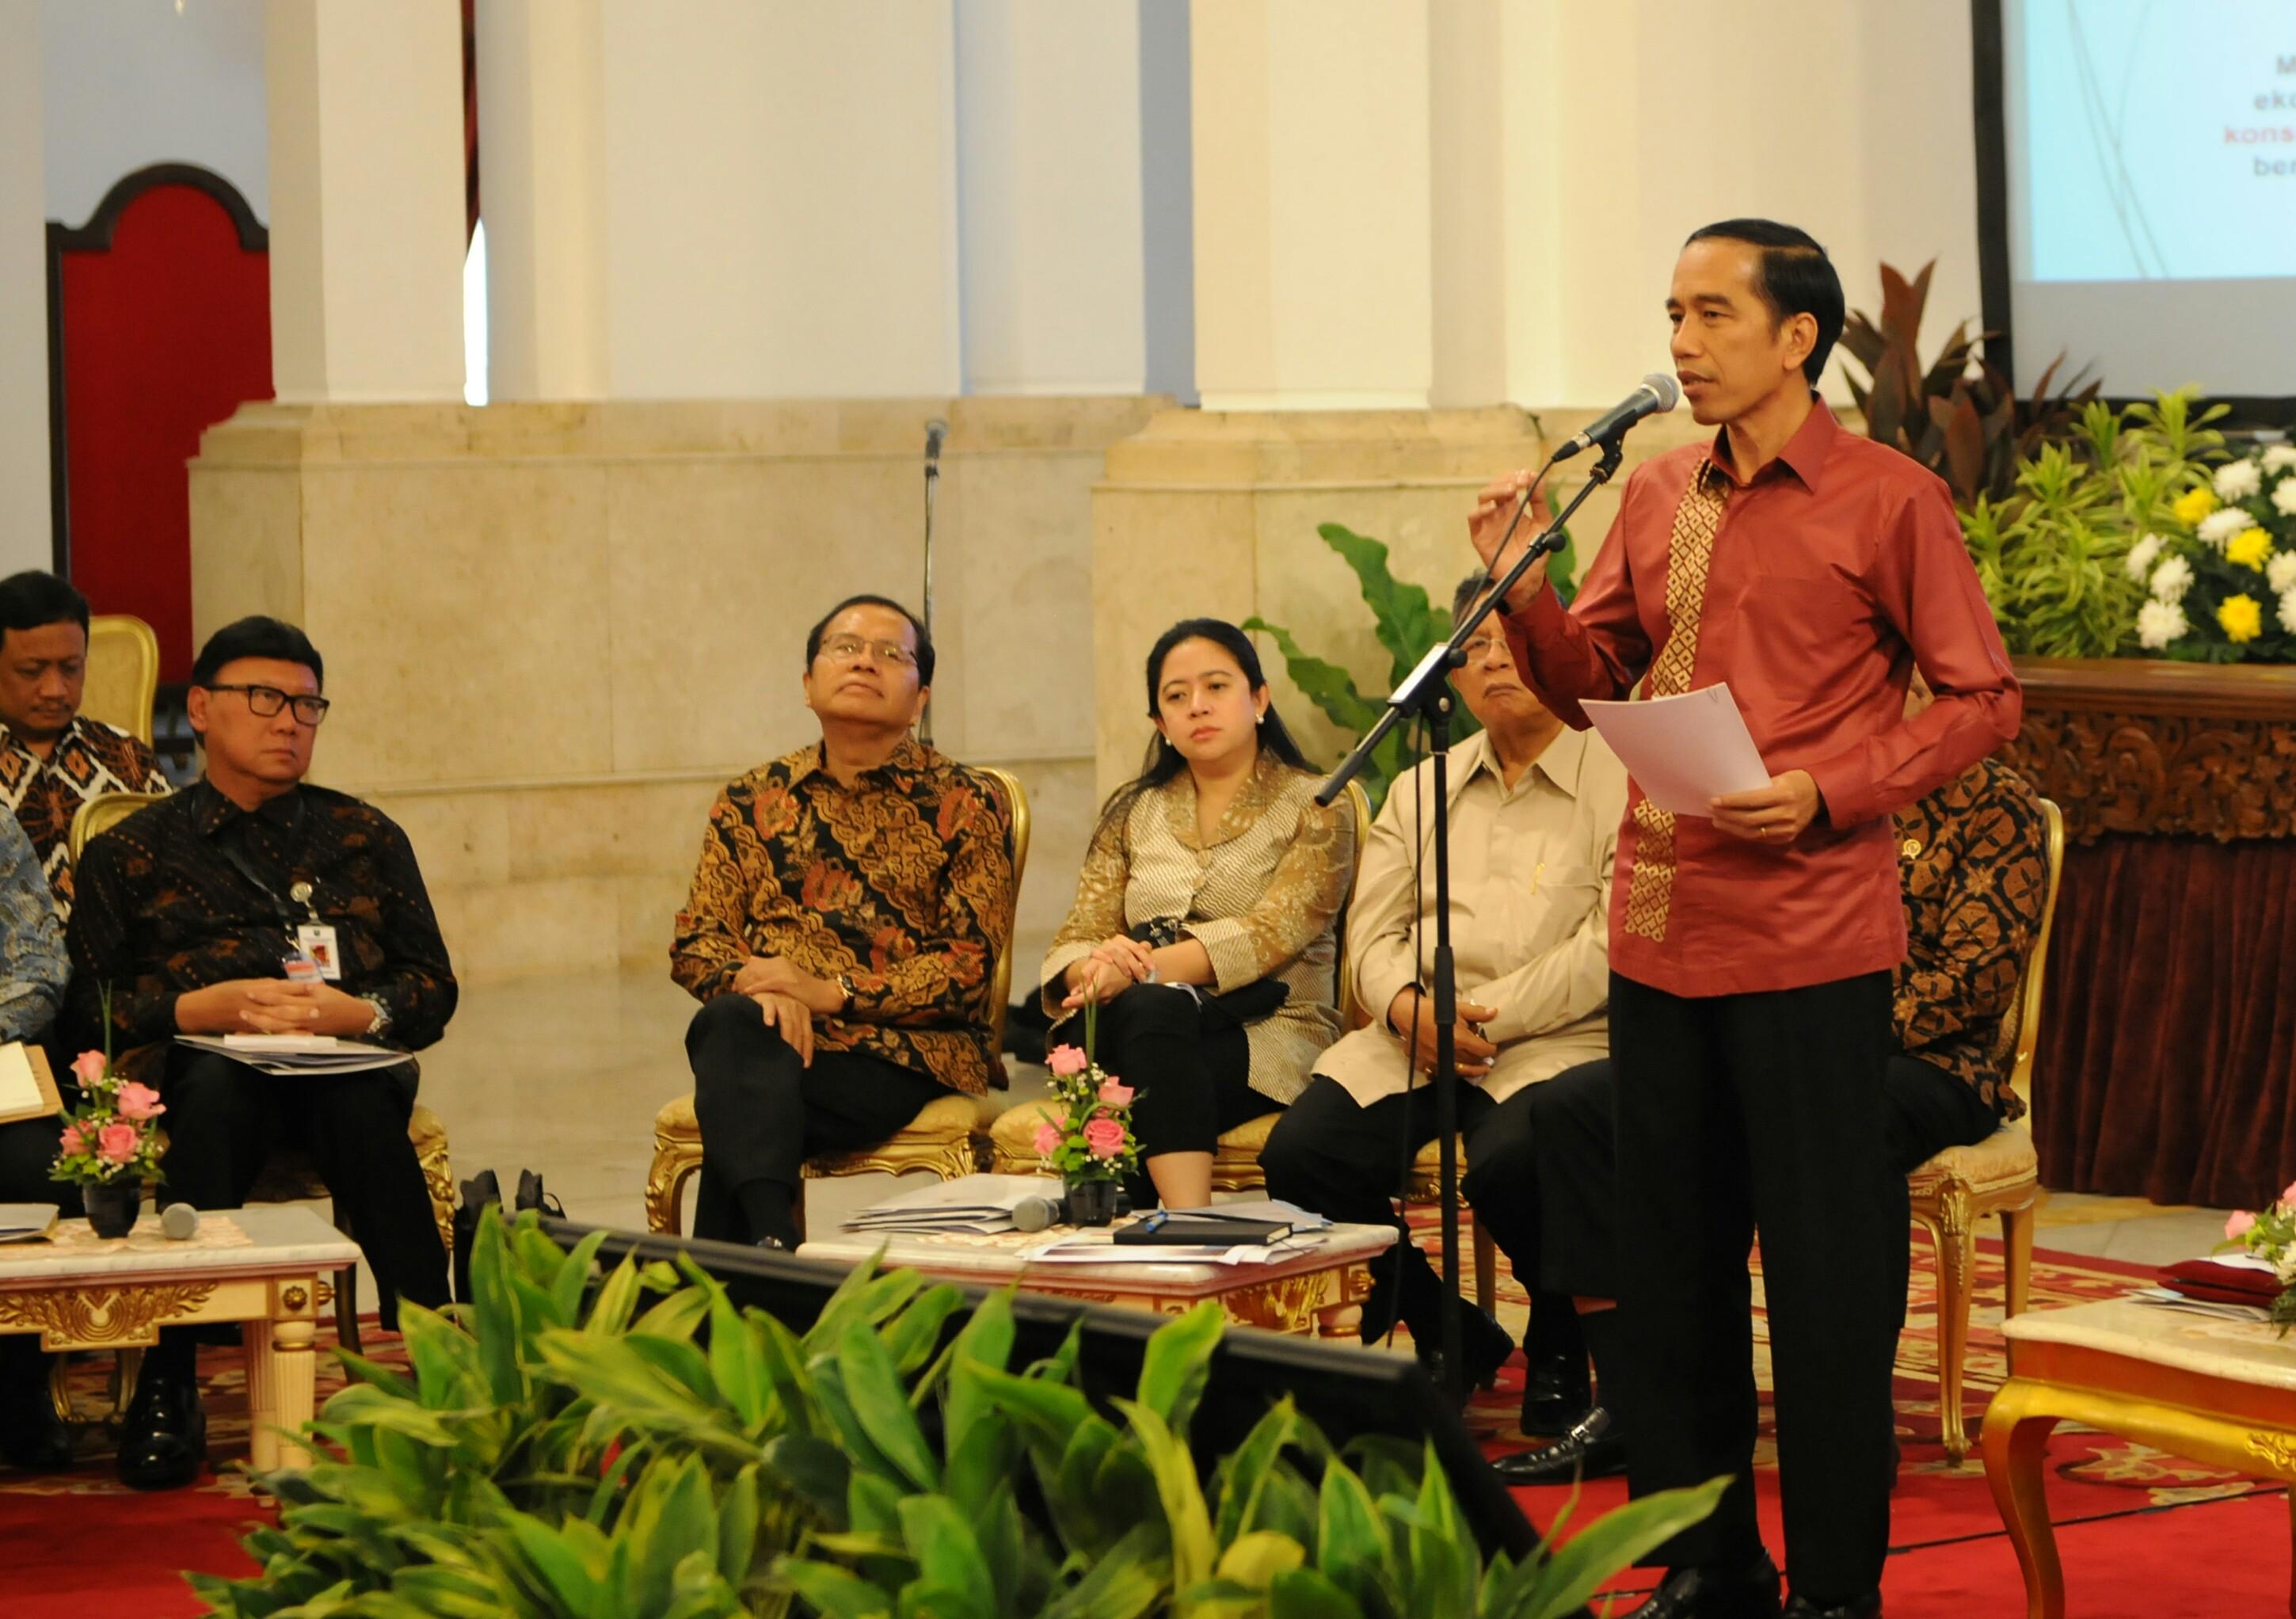 Presiden Jokowi memberikan arahan pada rapat dengan Gubernur, Bupati/Walikota, di Istana Negara, Jakarta, Rabu (21/10)